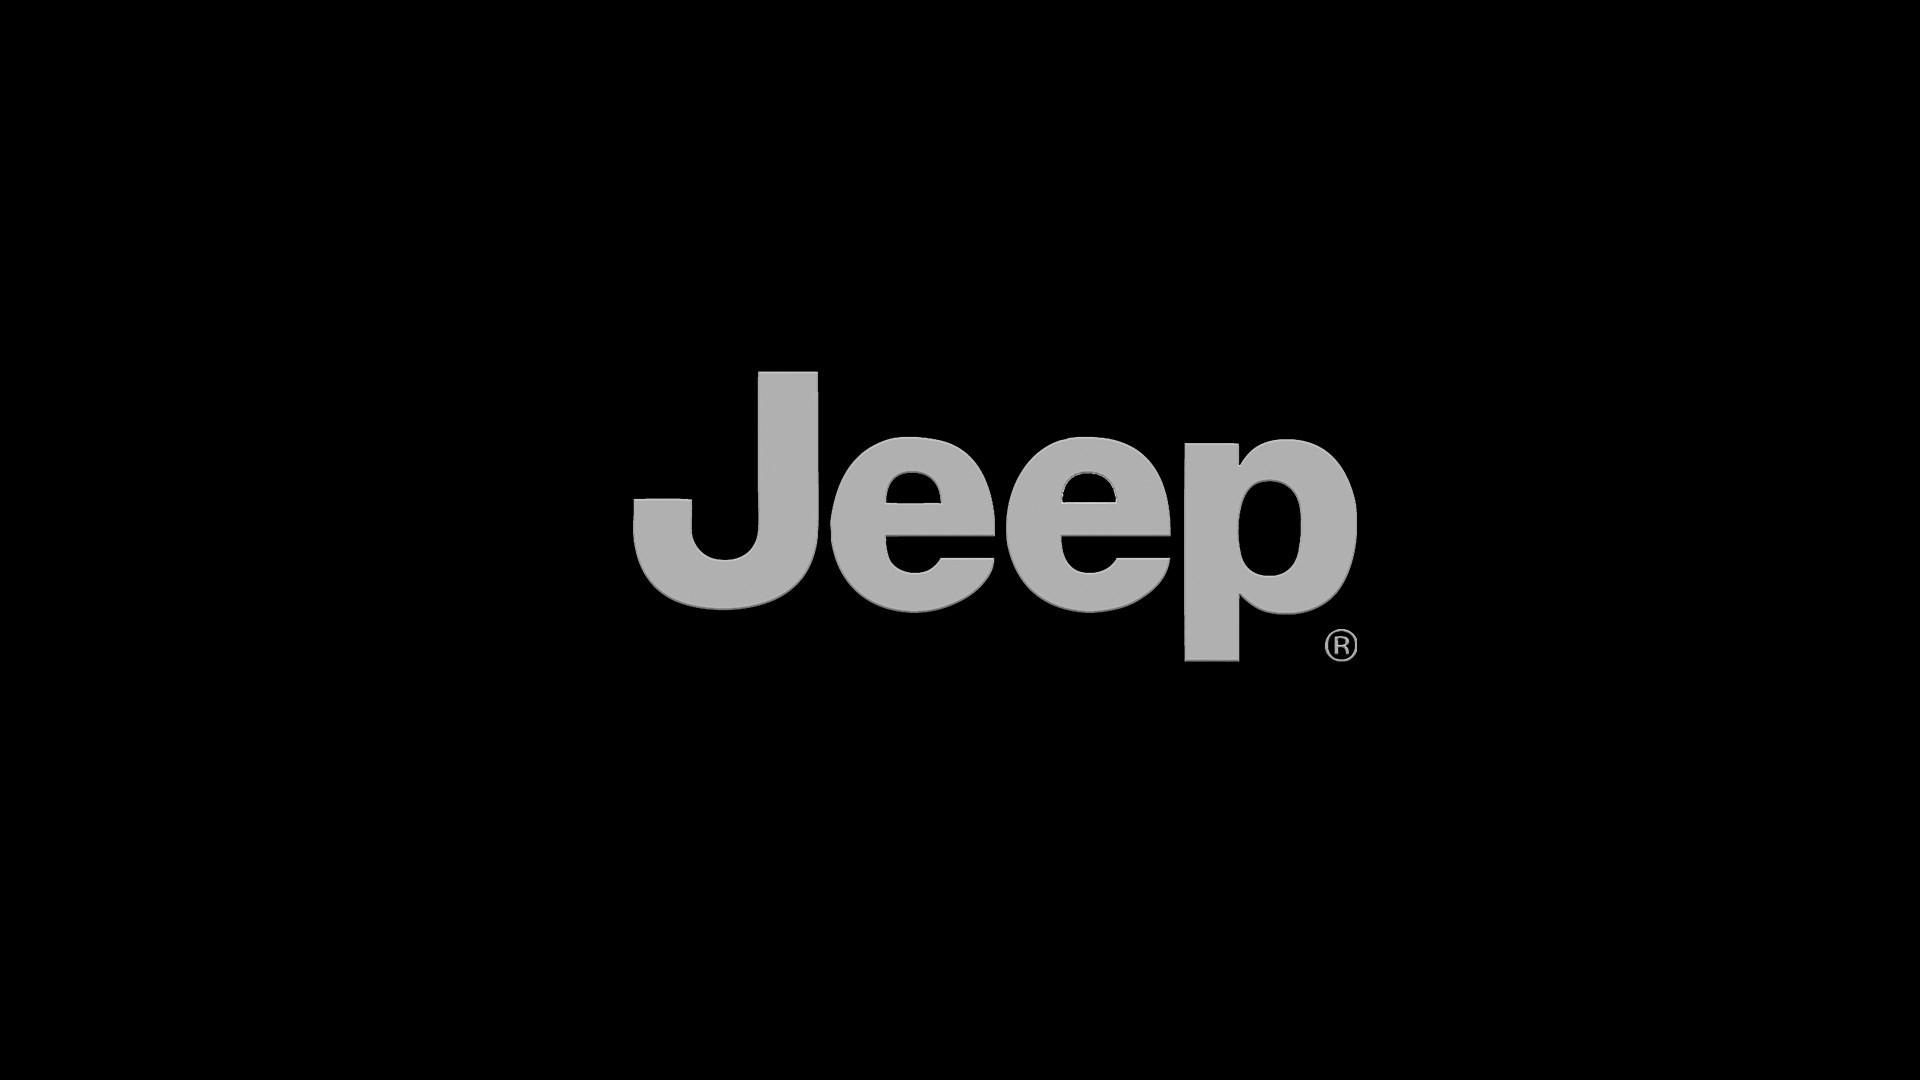 jeep logo wallpaper (61+ images)